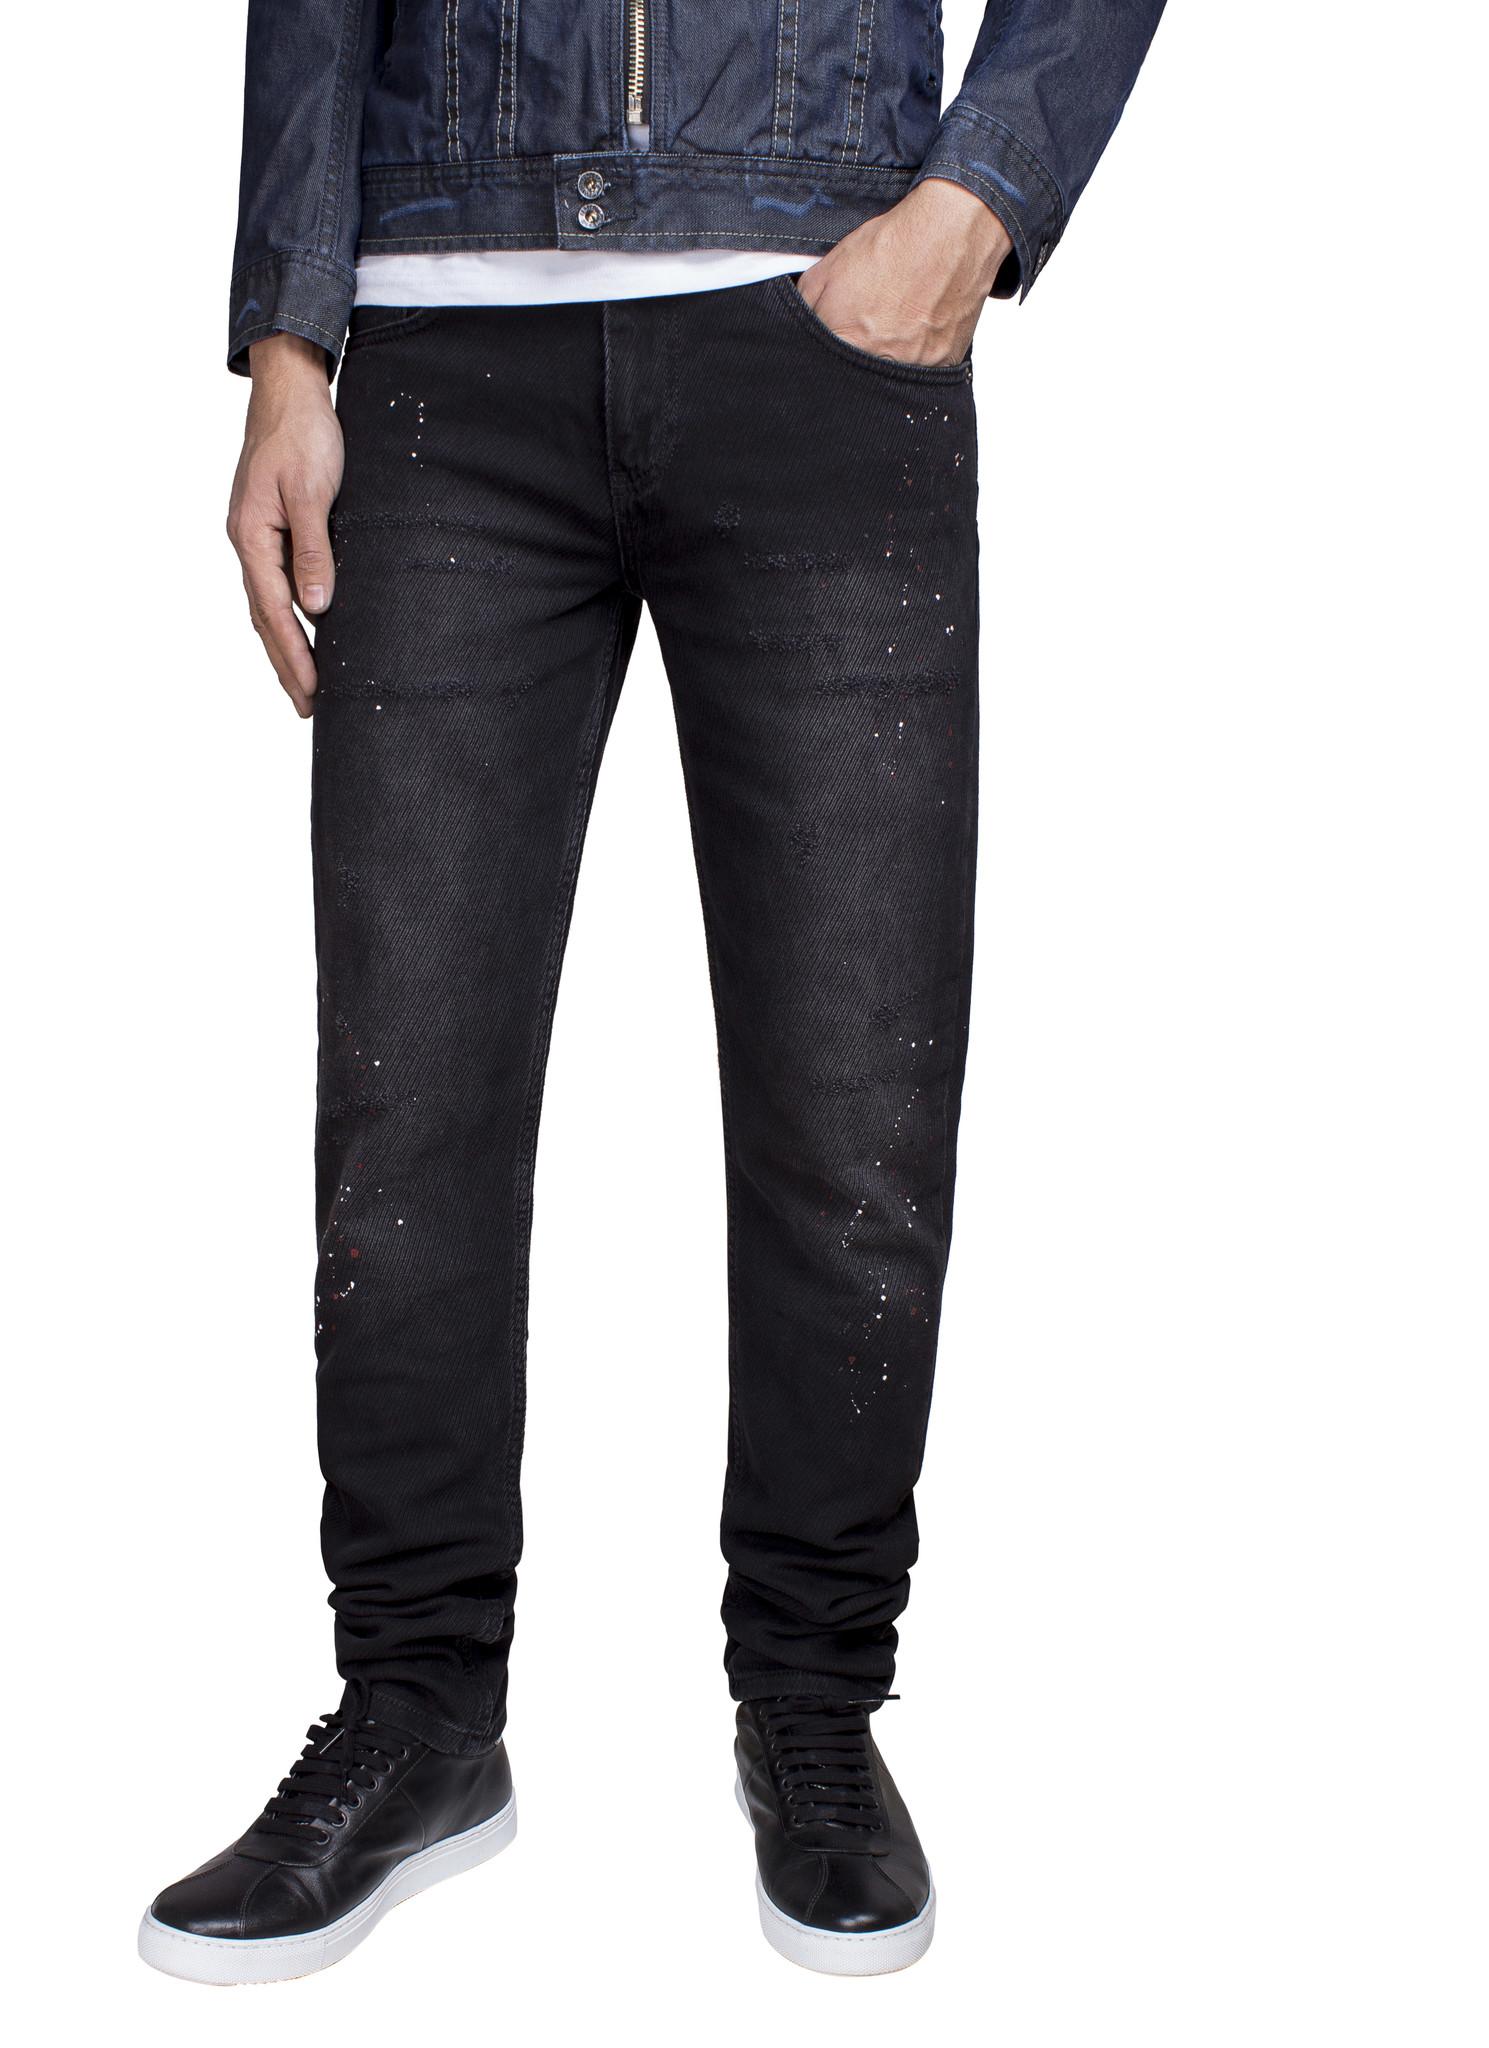 Arya Boy Jeans 82071 Black